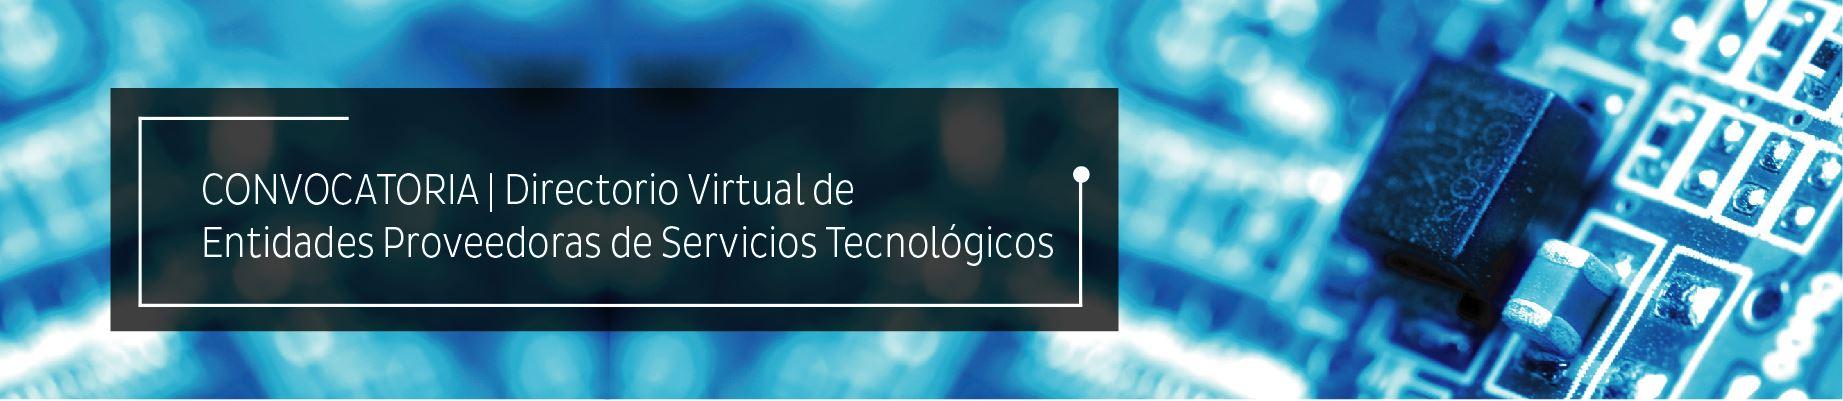 convocatoria servicios tecnológicos